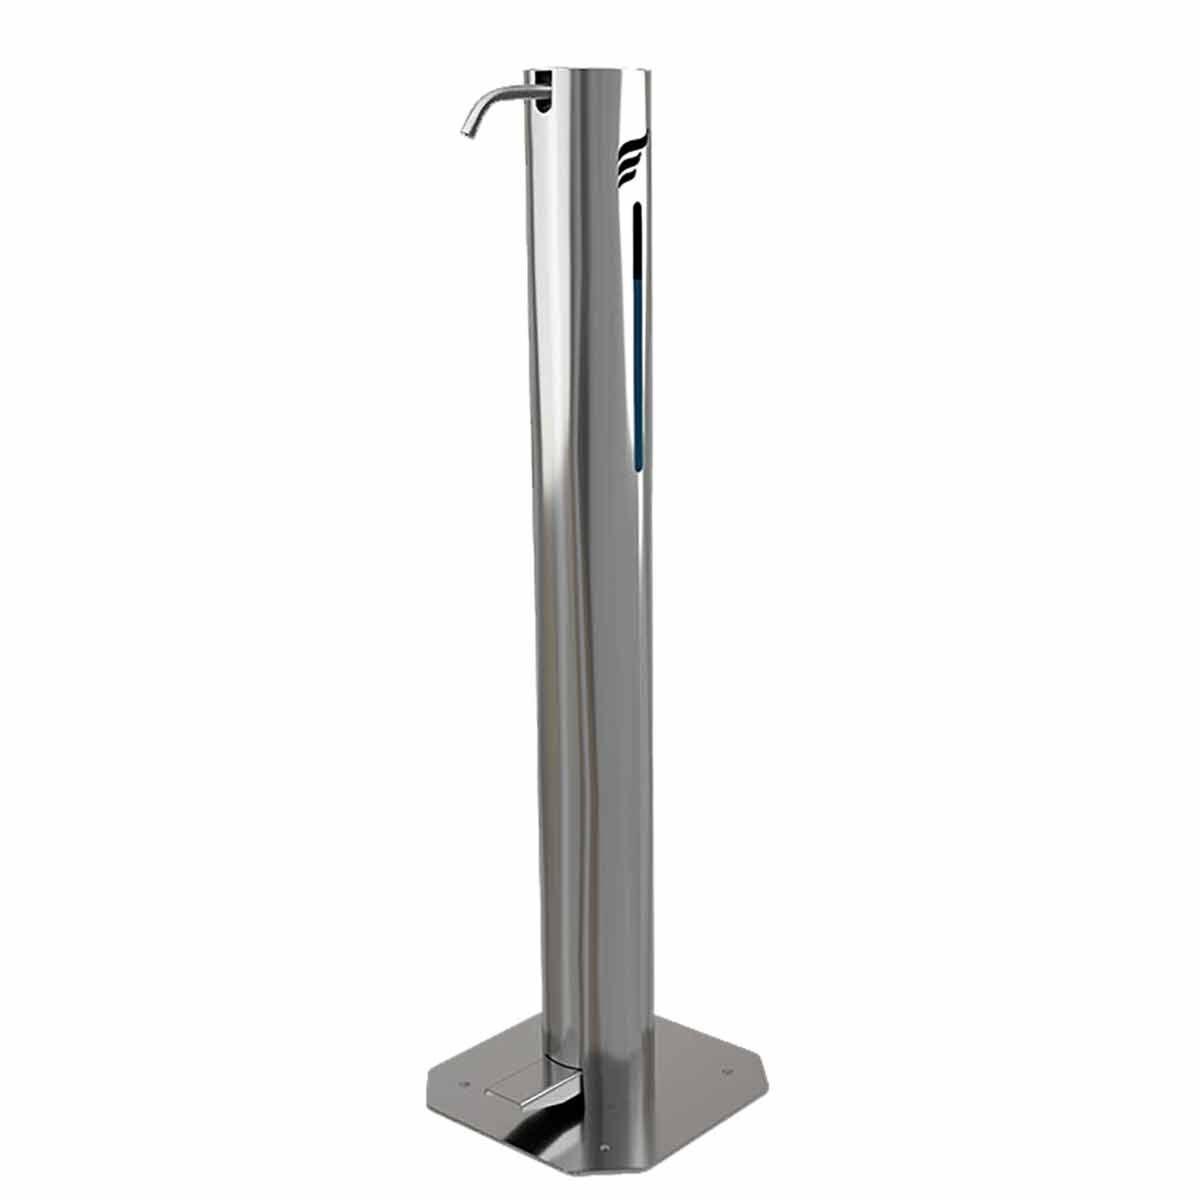 Astreea Foot Operated Sanitiser Dispenser Large